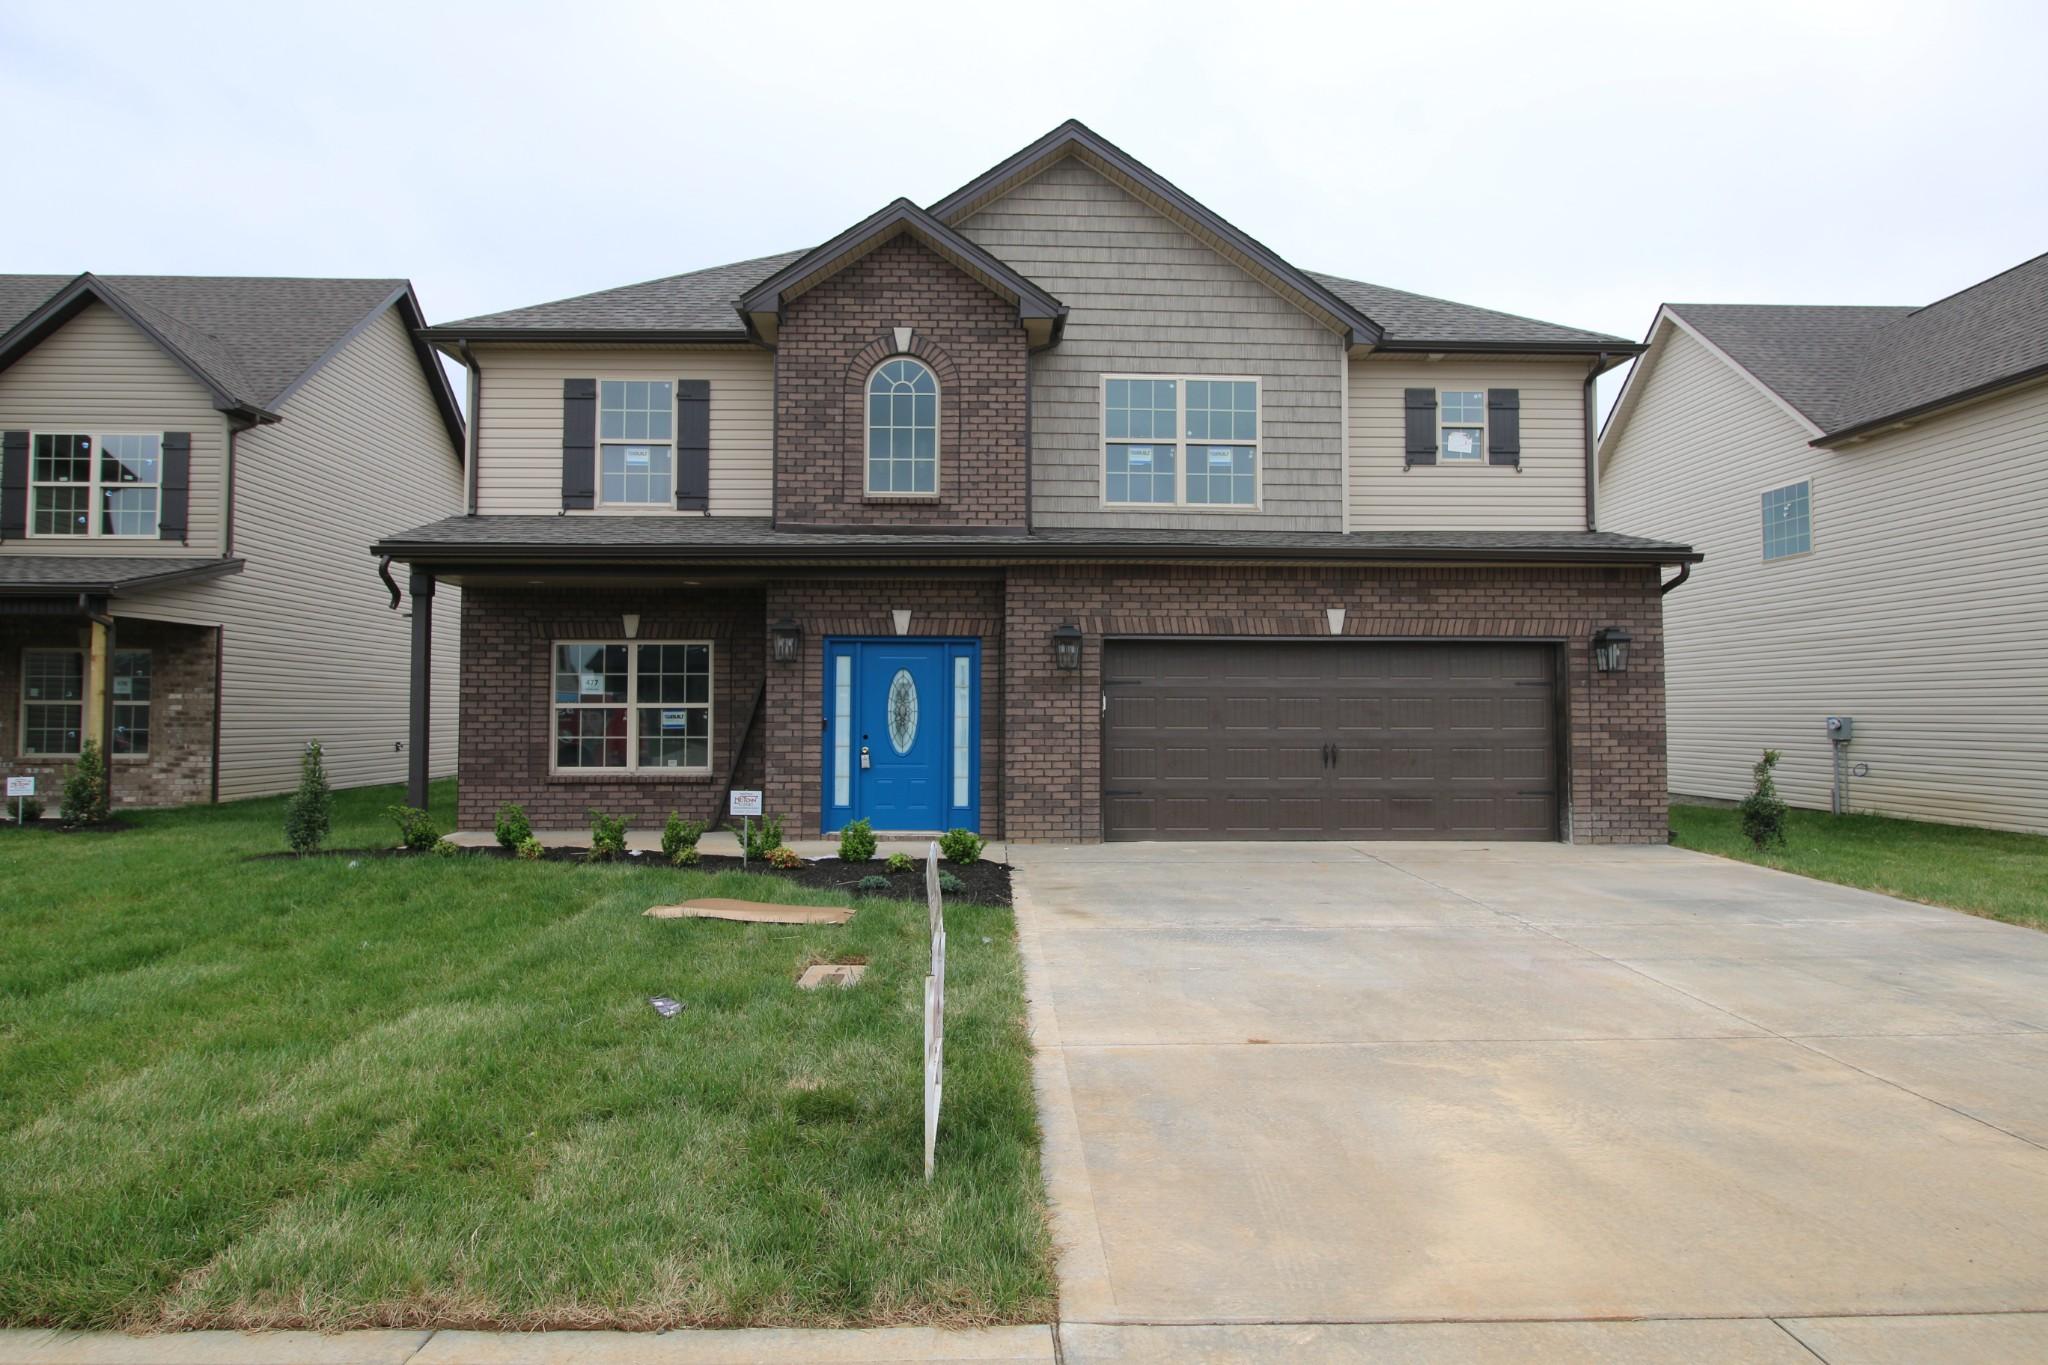 477 Autumn Creek Property Photo - Clarksville, TN real estate listing